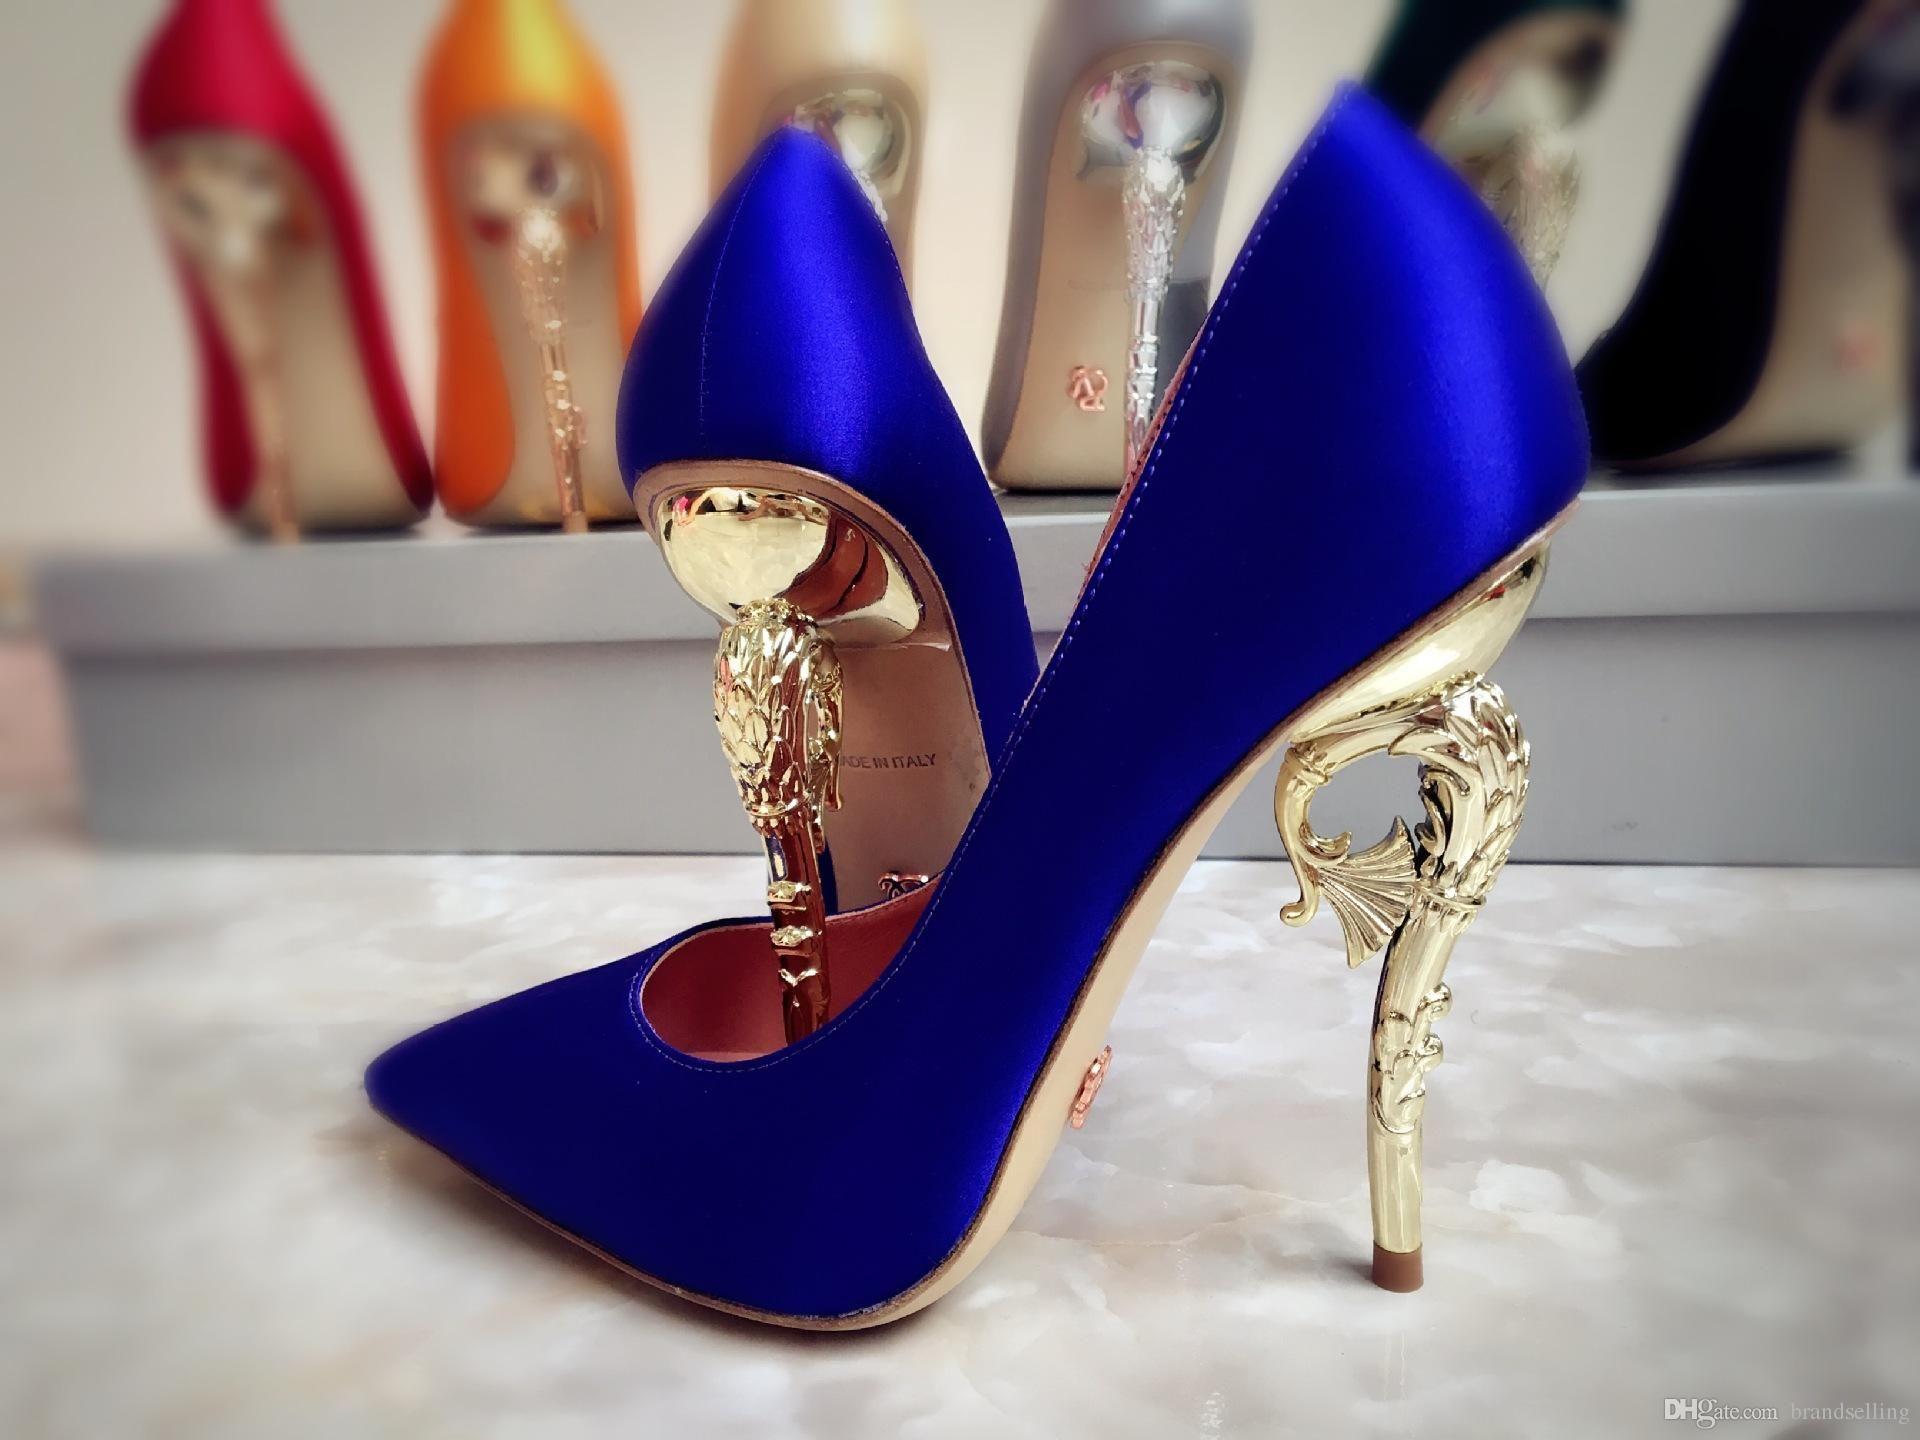 Ralph Russo Haute High Quality Women Shoes Dress Pumps Emerald